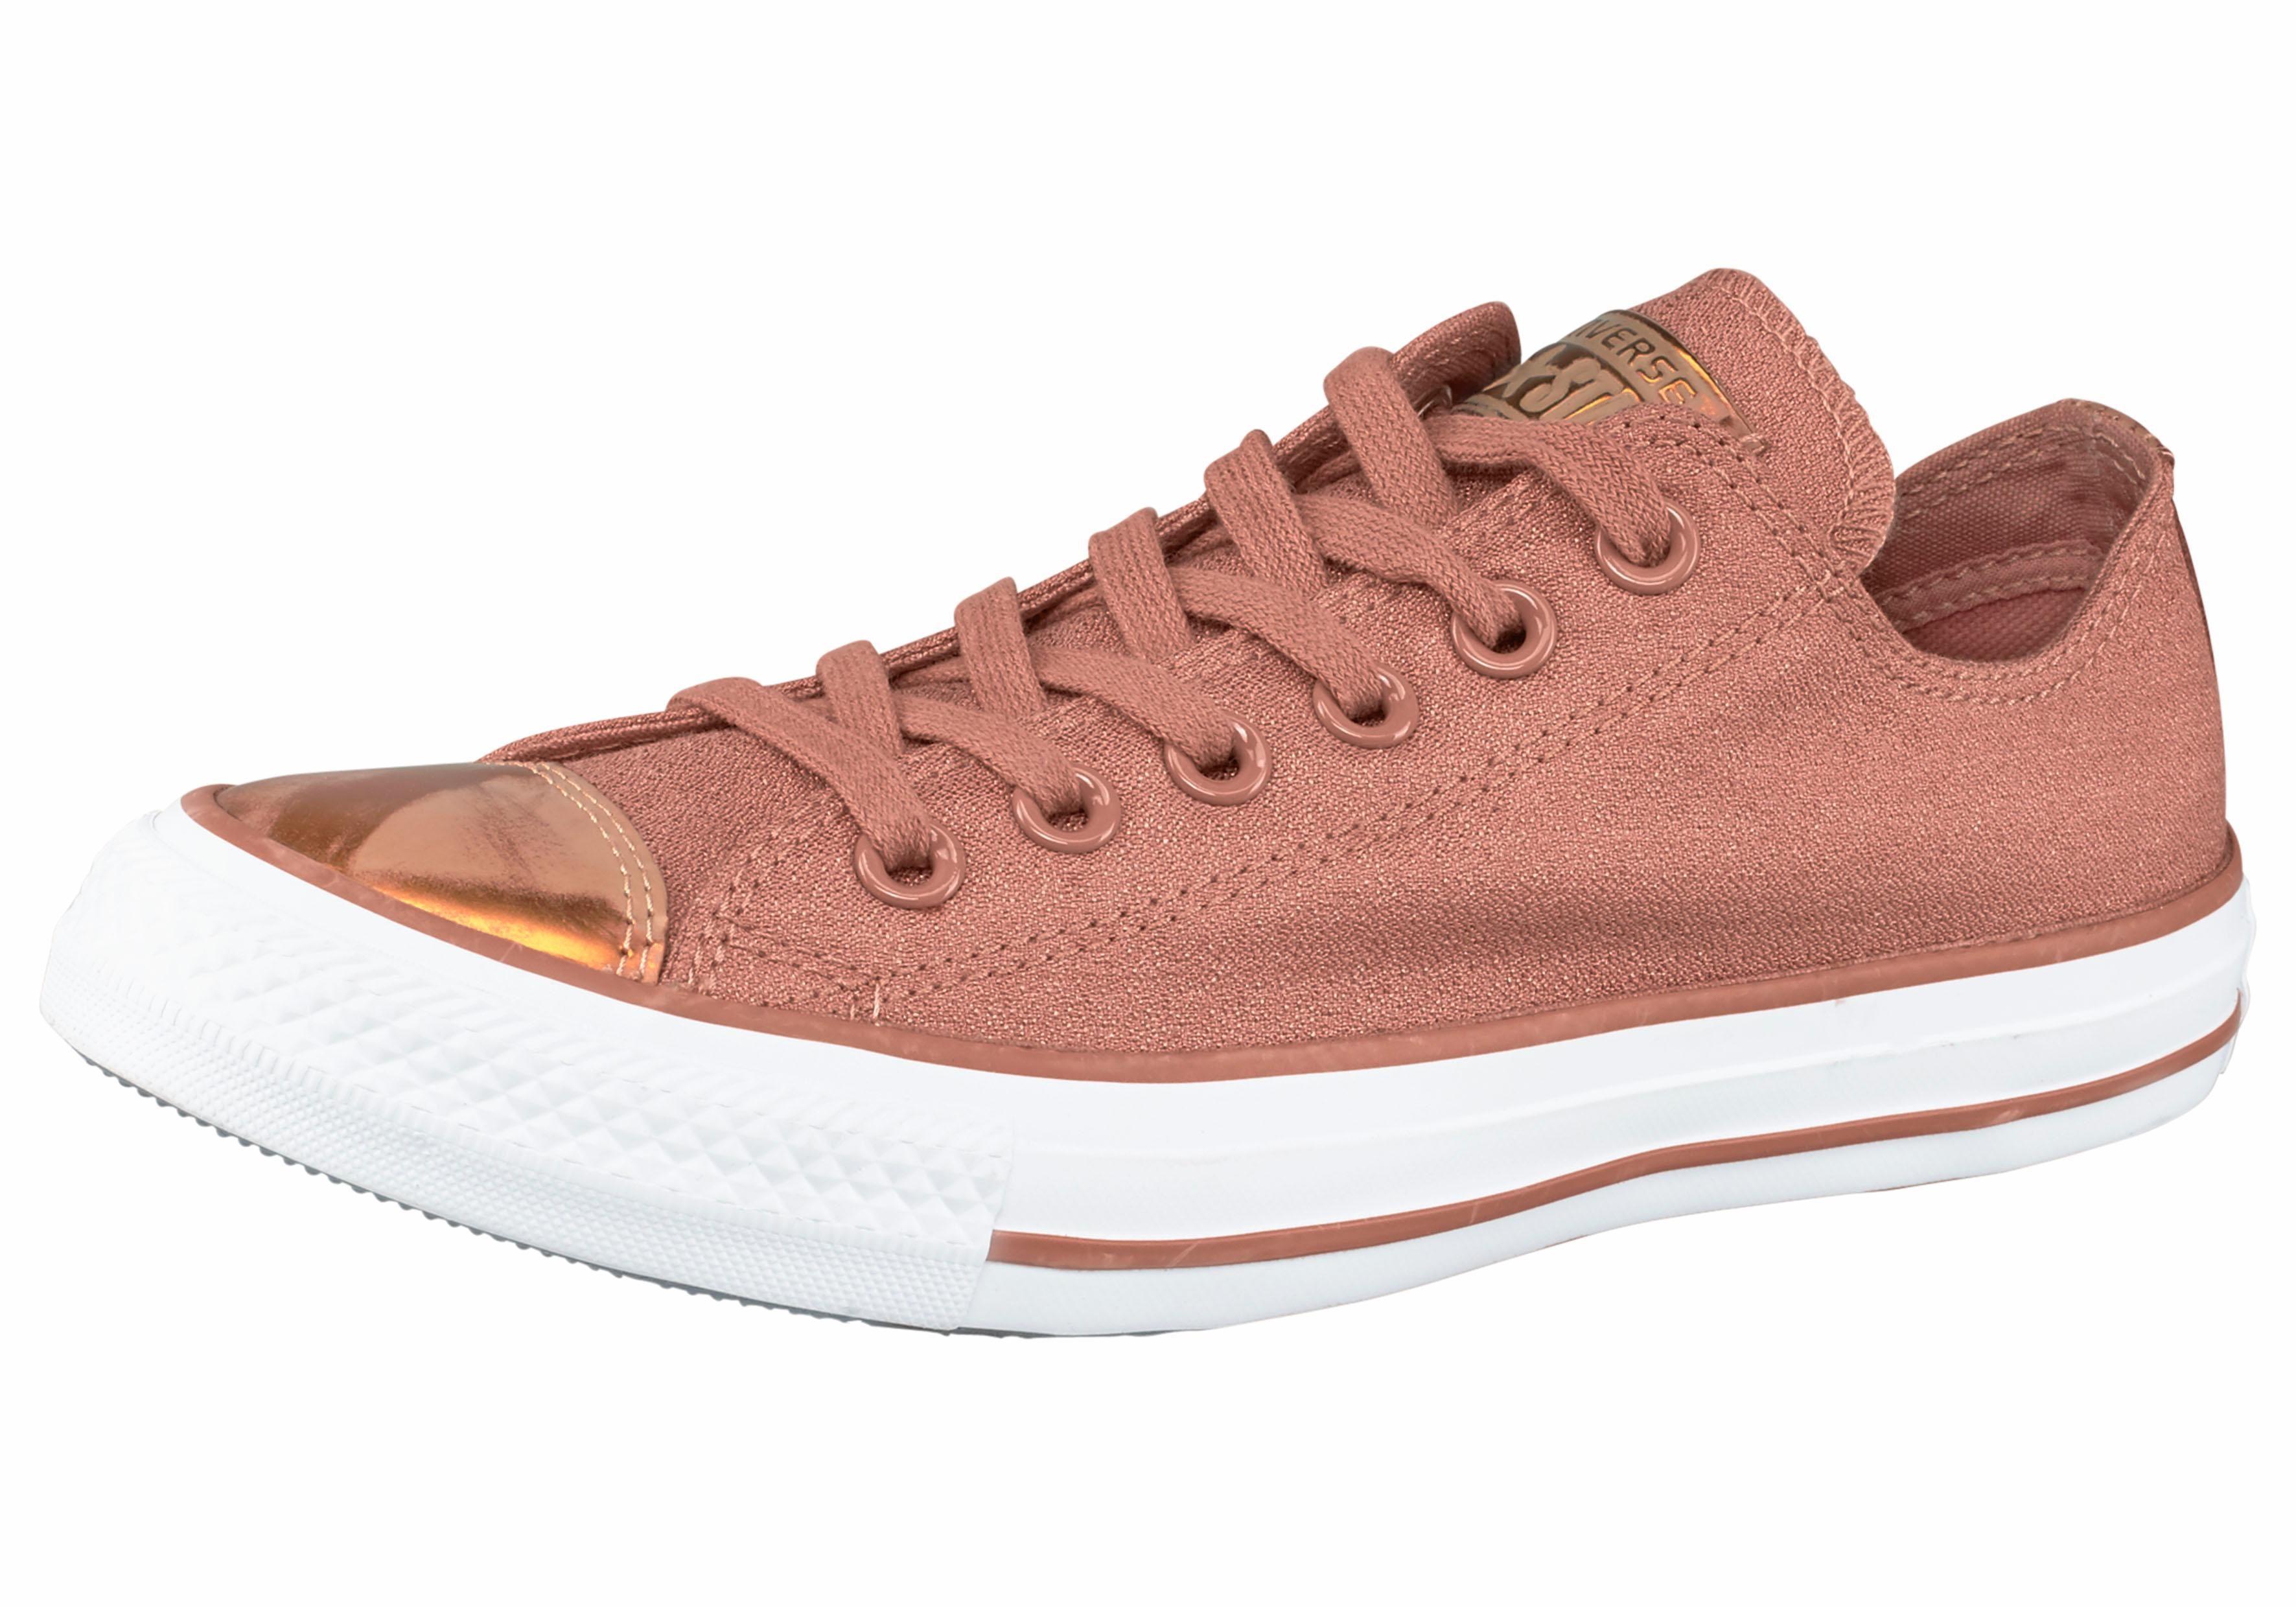 Converse Chuck Taylor All Star Brush Off Toecap Ox Sneaker online kaufen  kupfer-goldfarben